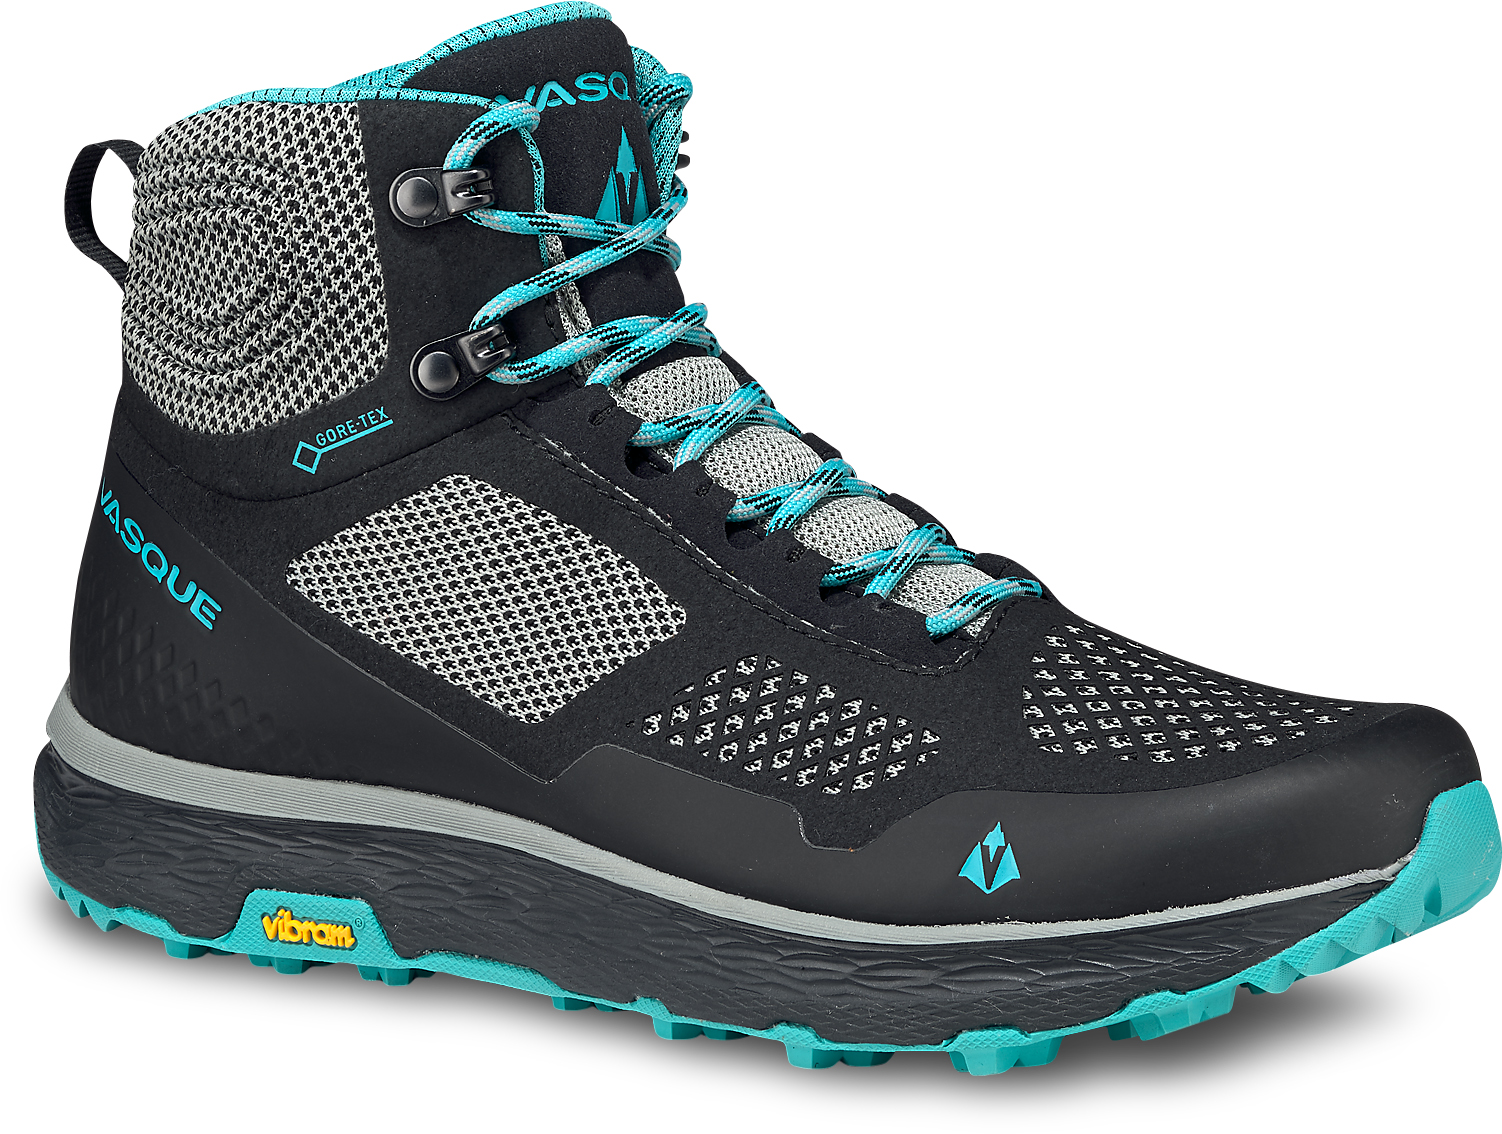 b6b3535ba5b Vasque Breeze LT Mid Gore-Tex Light Trail Shoes - Women's